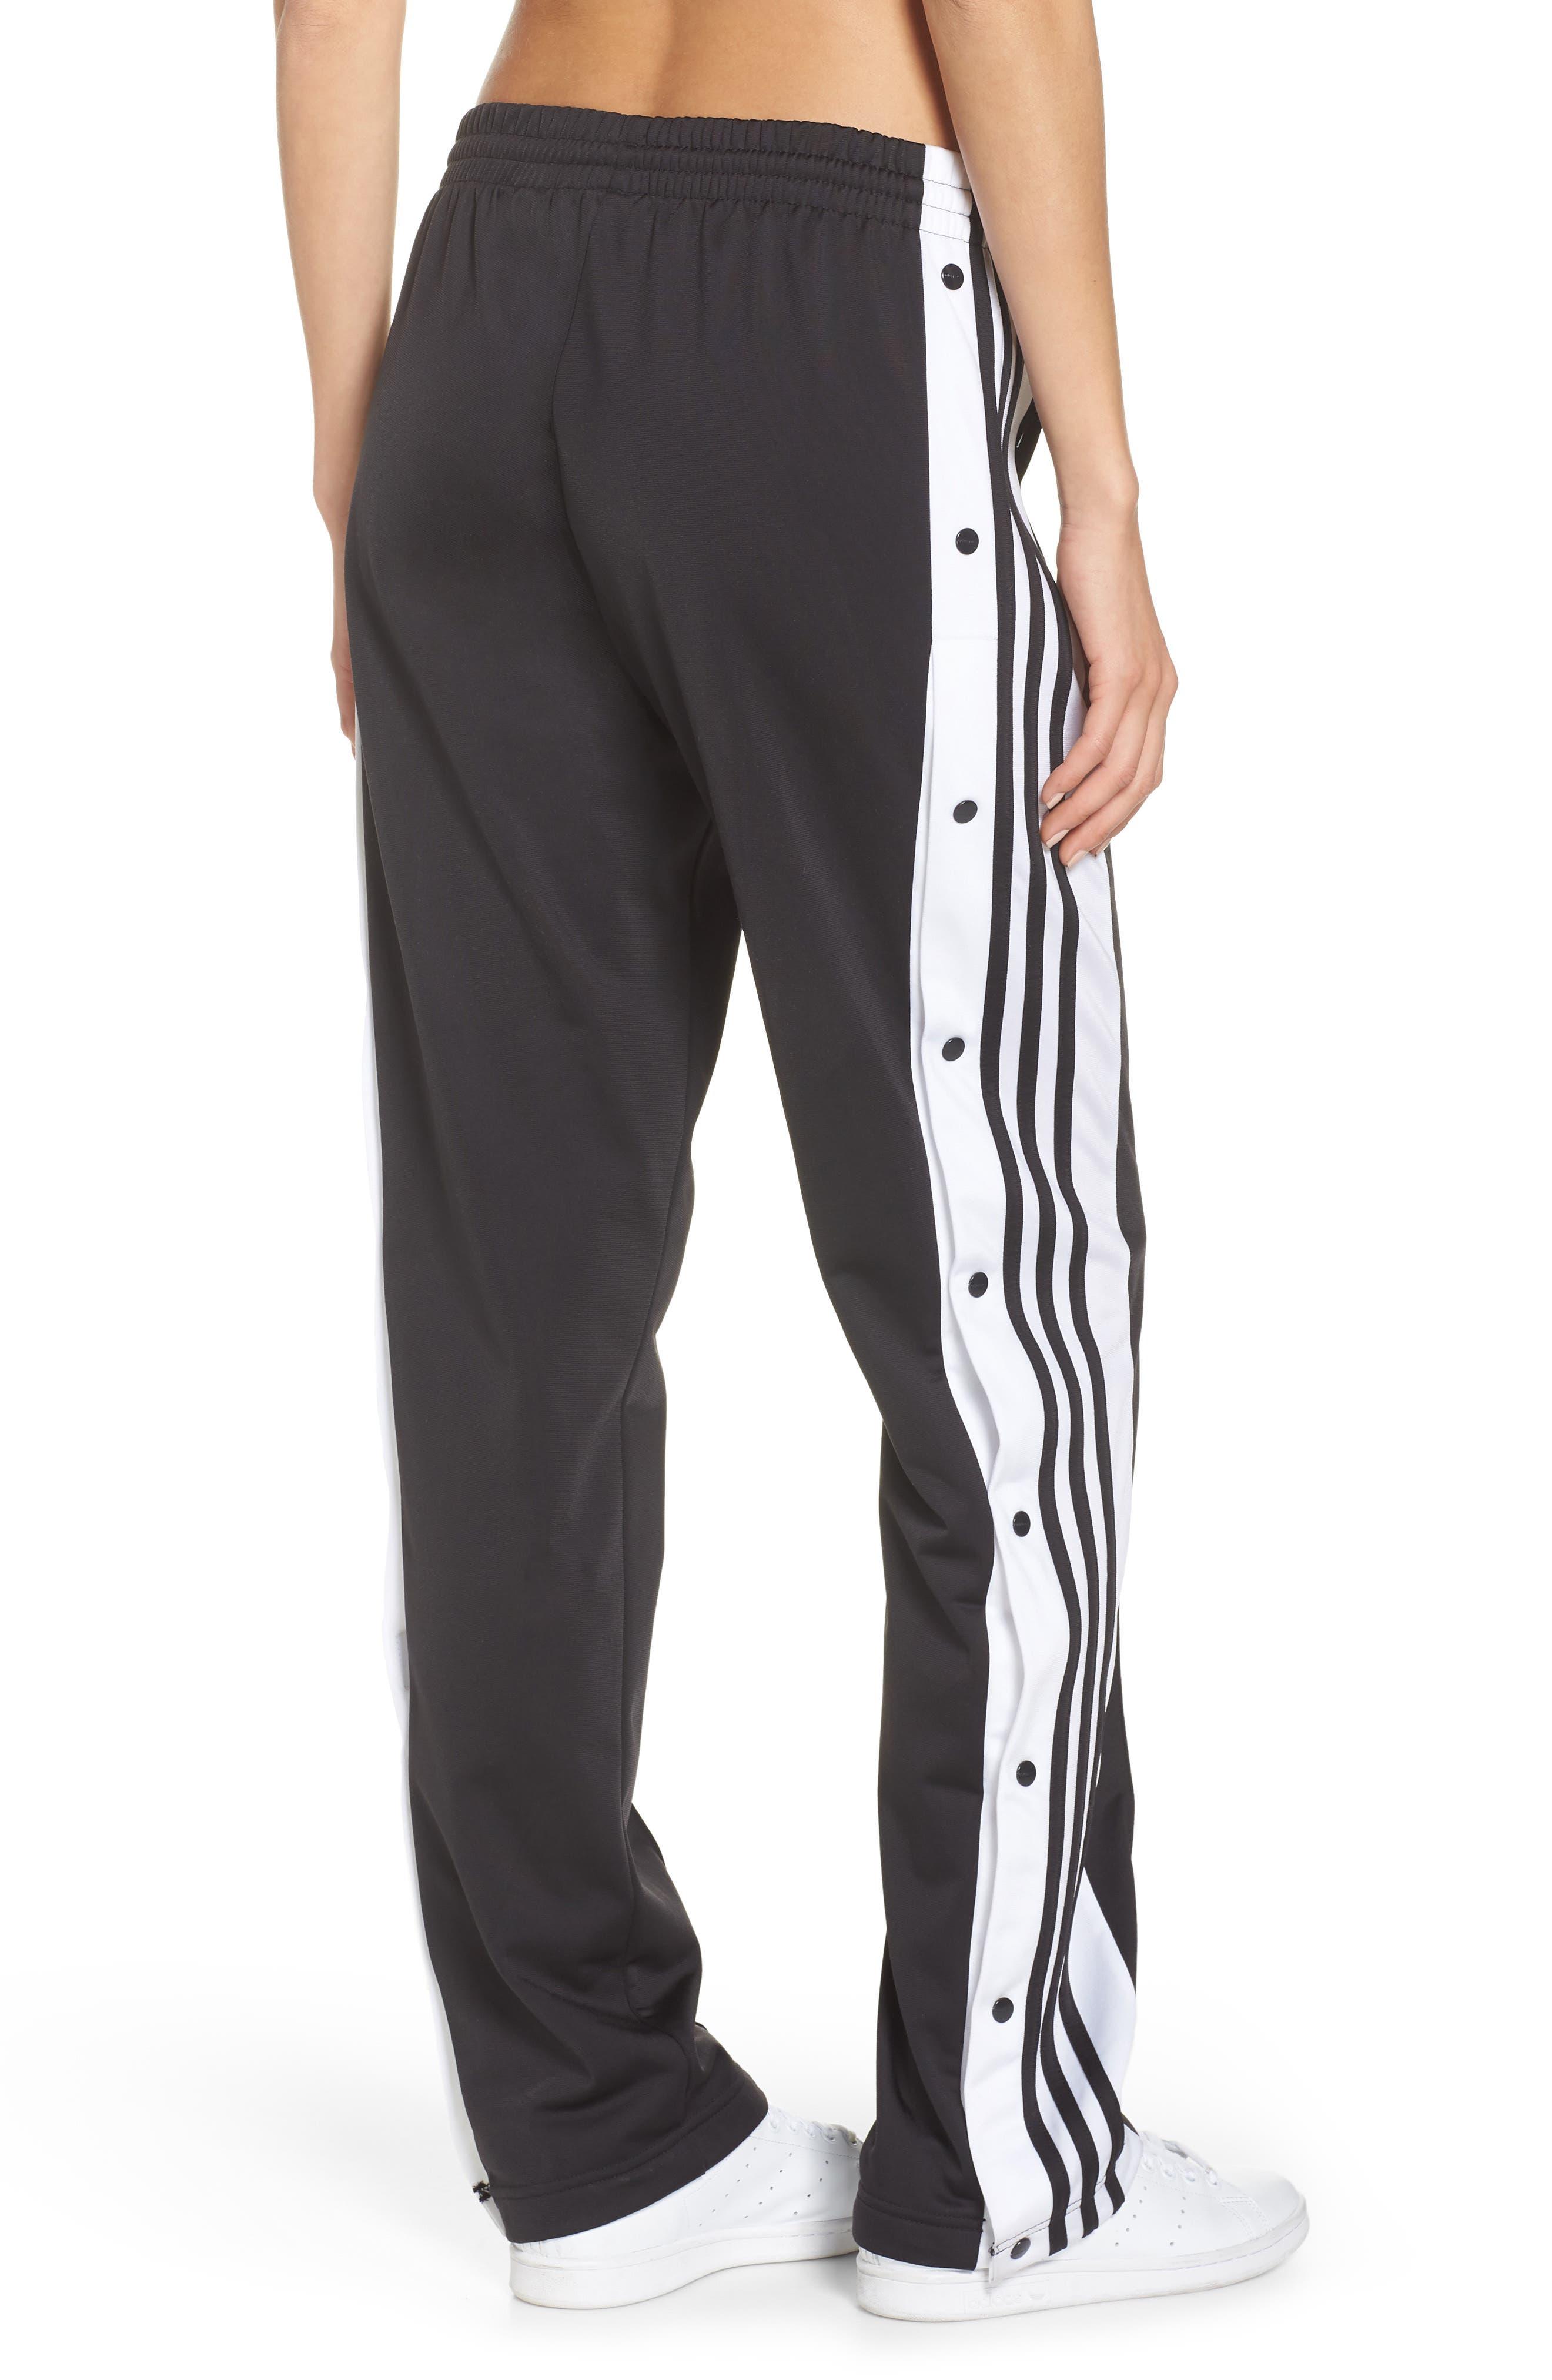 Adibreak Tearaway Track Pants,                             Alternate thumbnail 2, color,                             BLACK/ CARBON